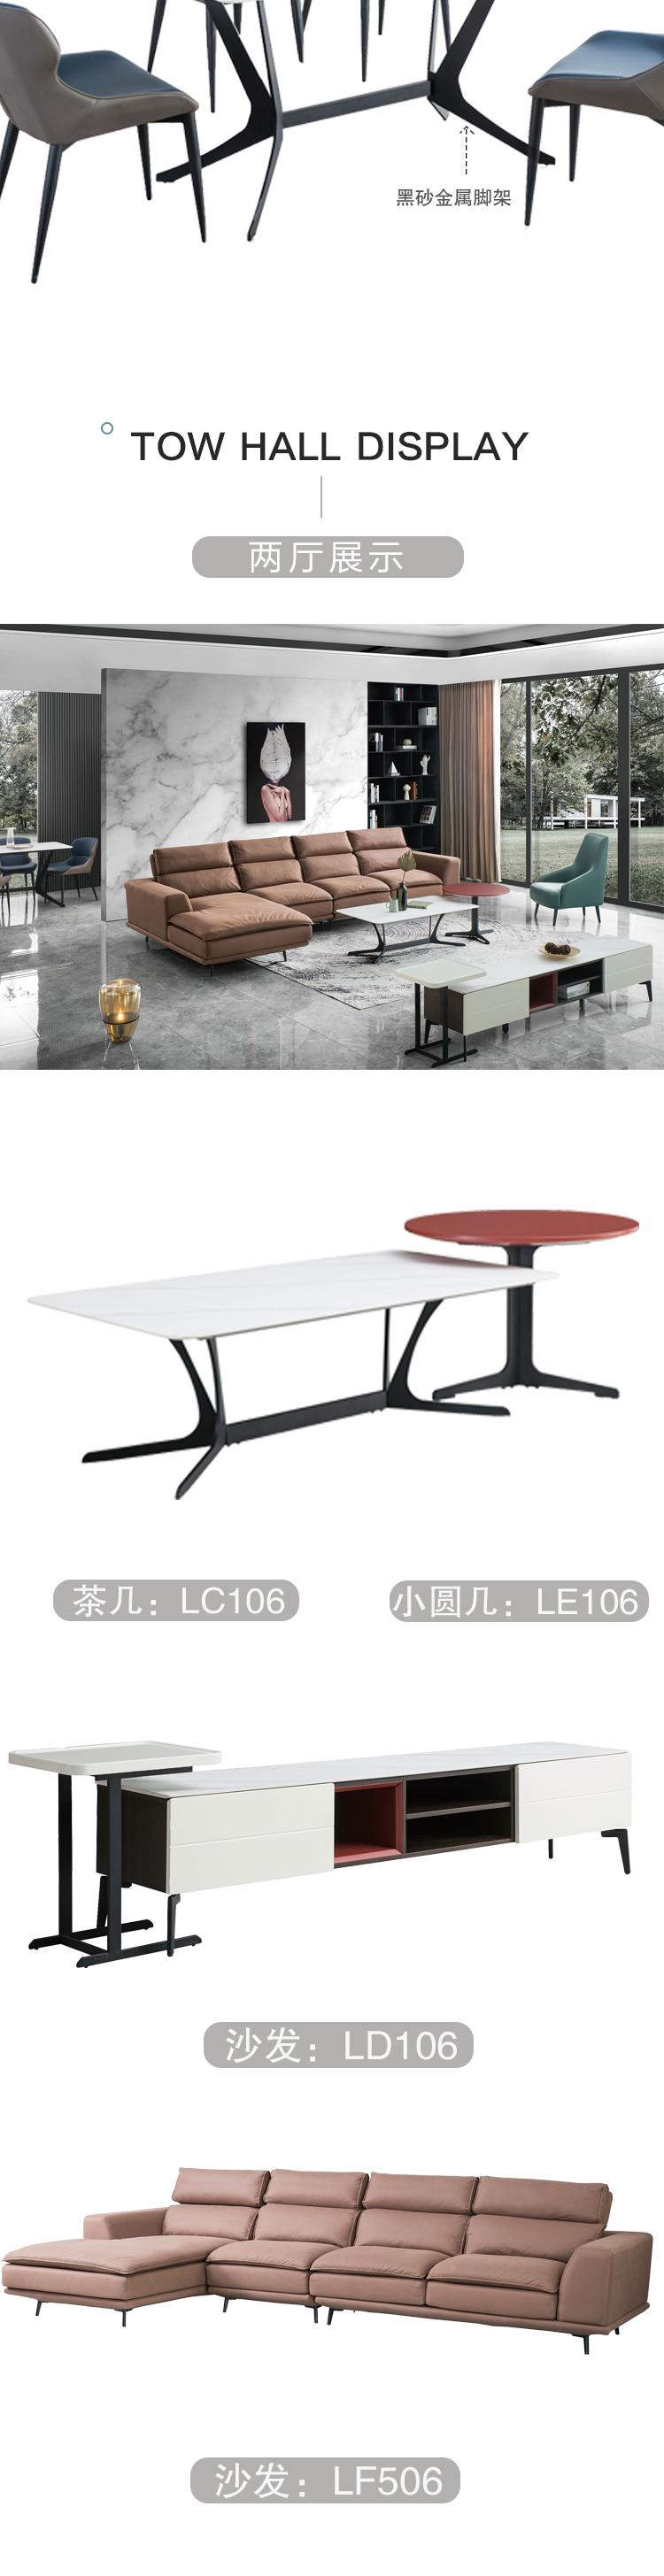 LT106餐桌椅_04.jpg